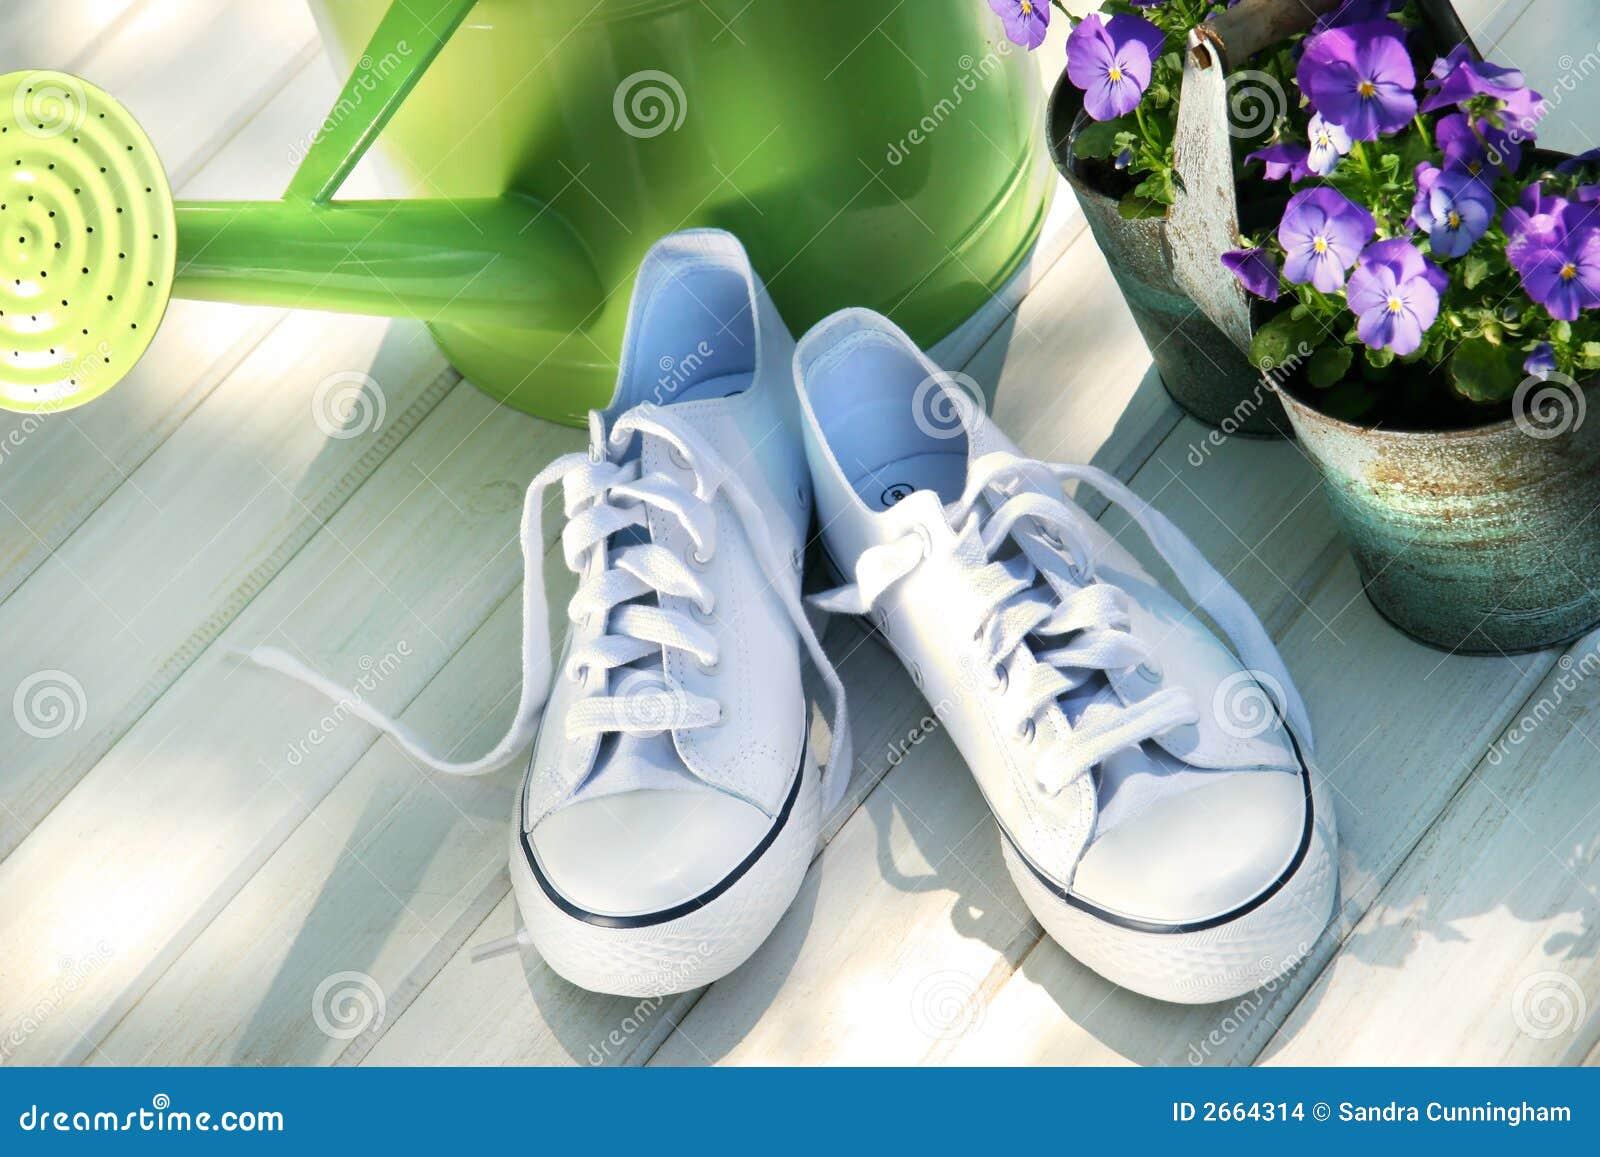 White tennis running shoes